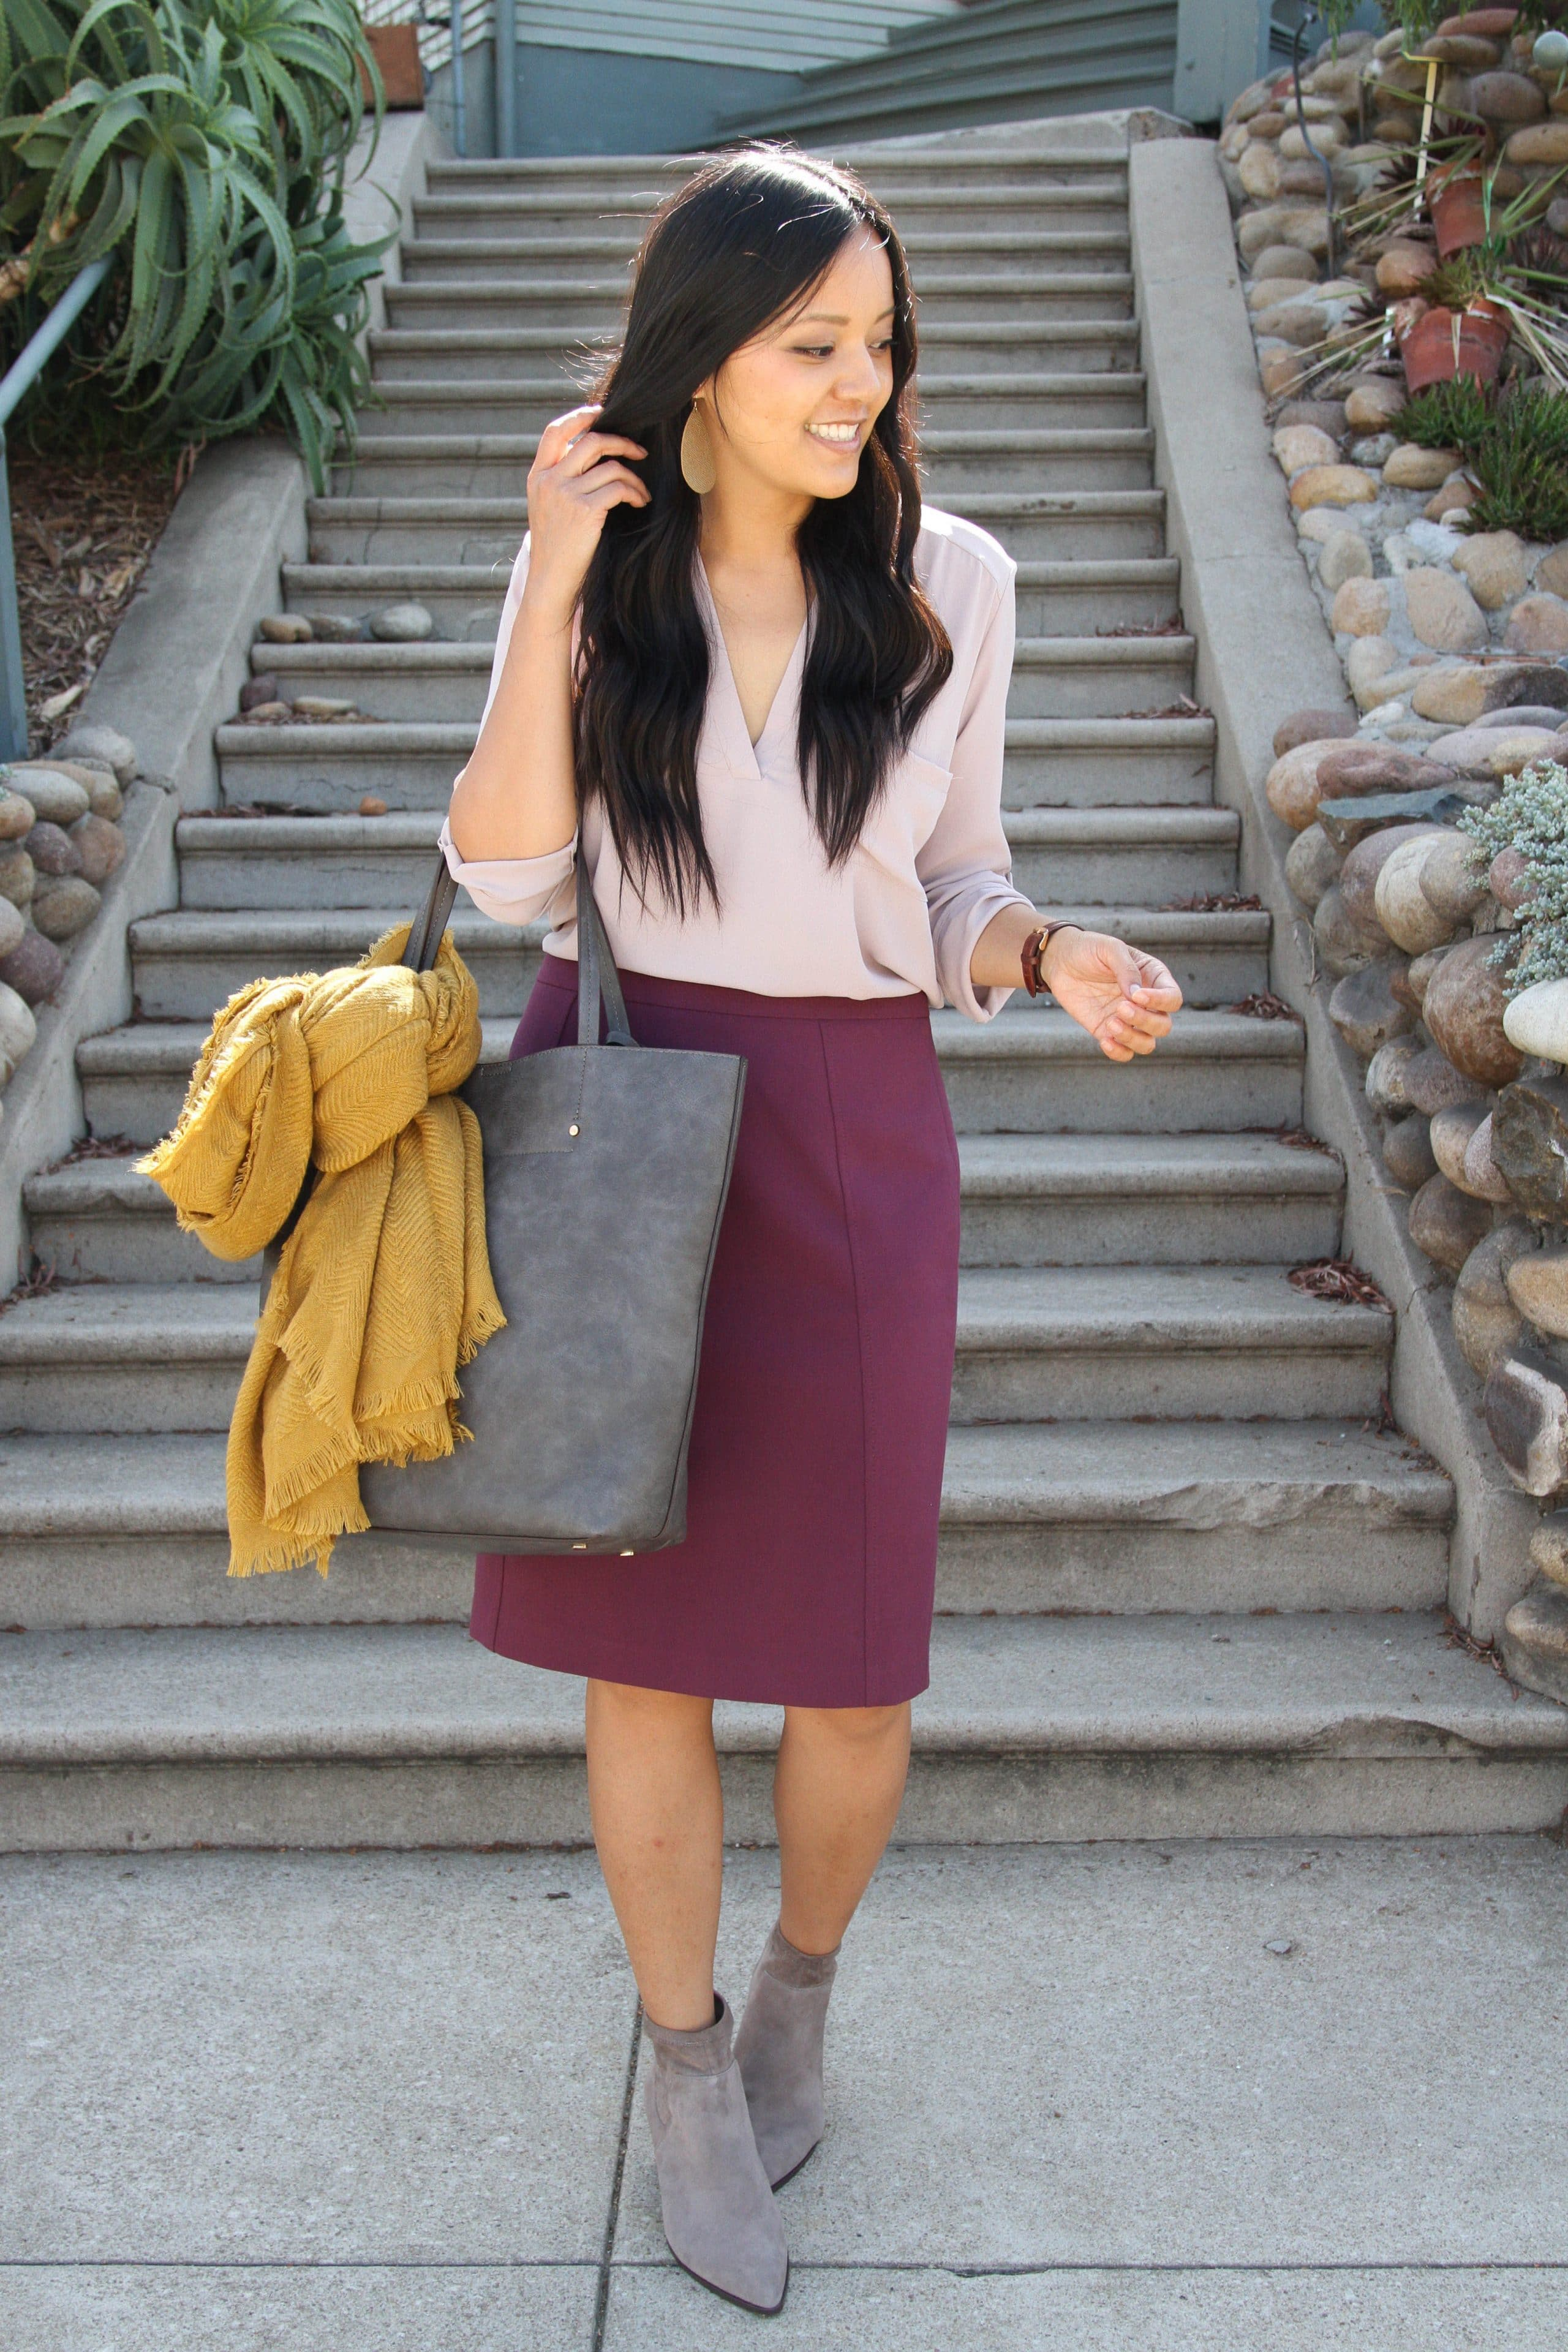 Blush Top + Maroon Skirt + Booties + Gray Bag + Mustard Scarf